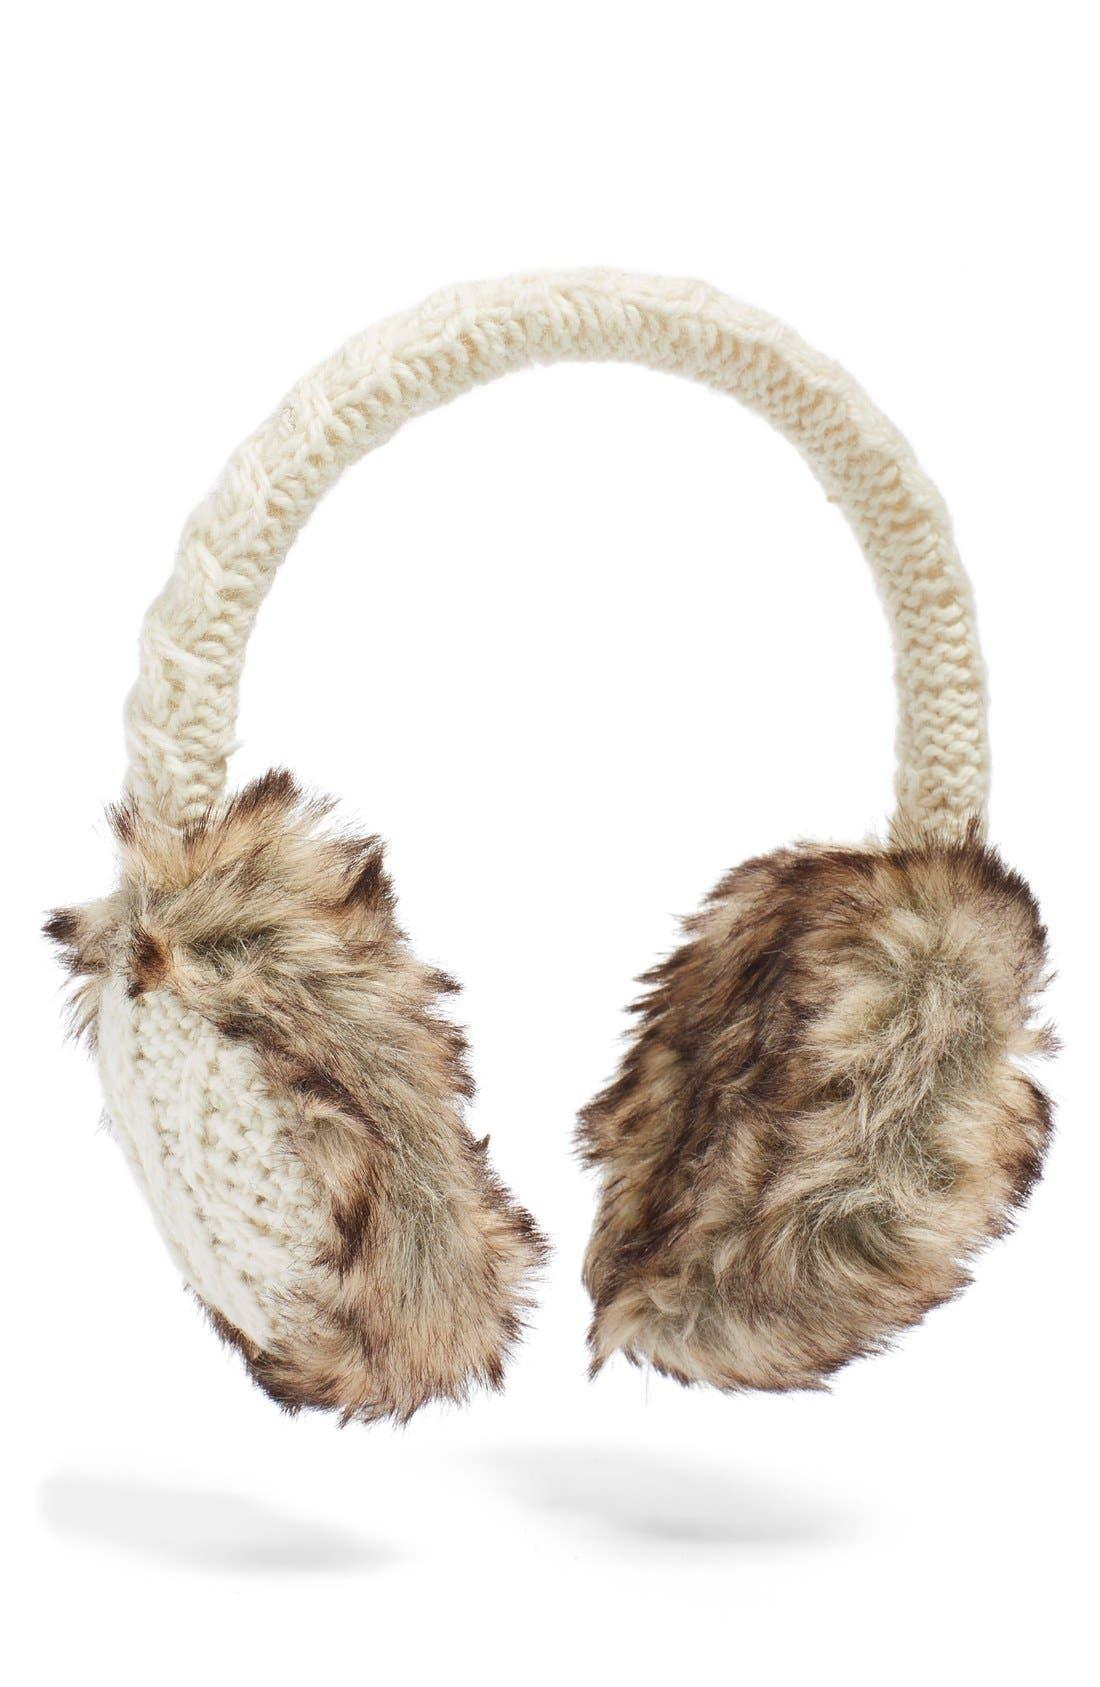 Main Image - Nirvanna Designs Cable Knit Earmuffs